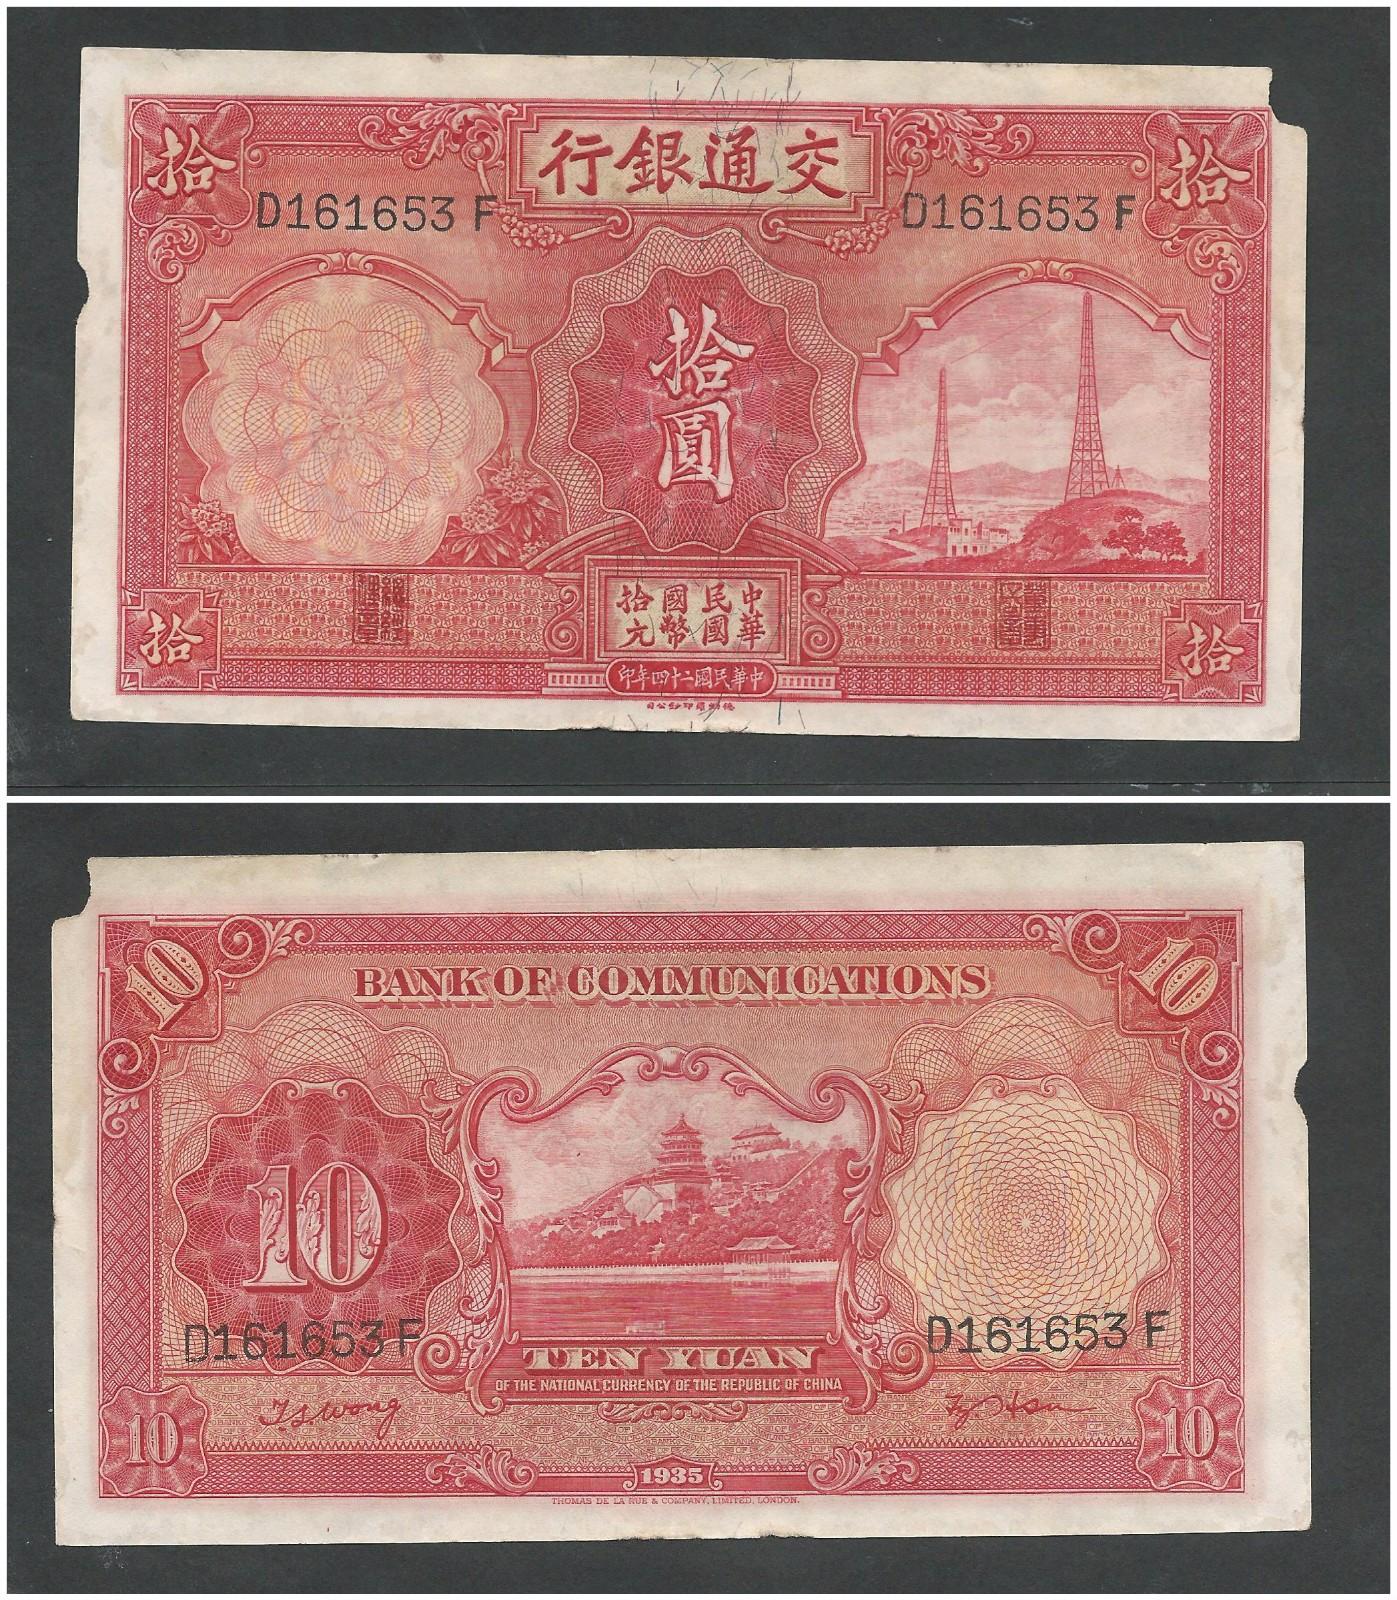 REPUBLIC OF CHINA 10 YUAN 1935 P 155 BANK OF COMMUNICATIONS AUNC